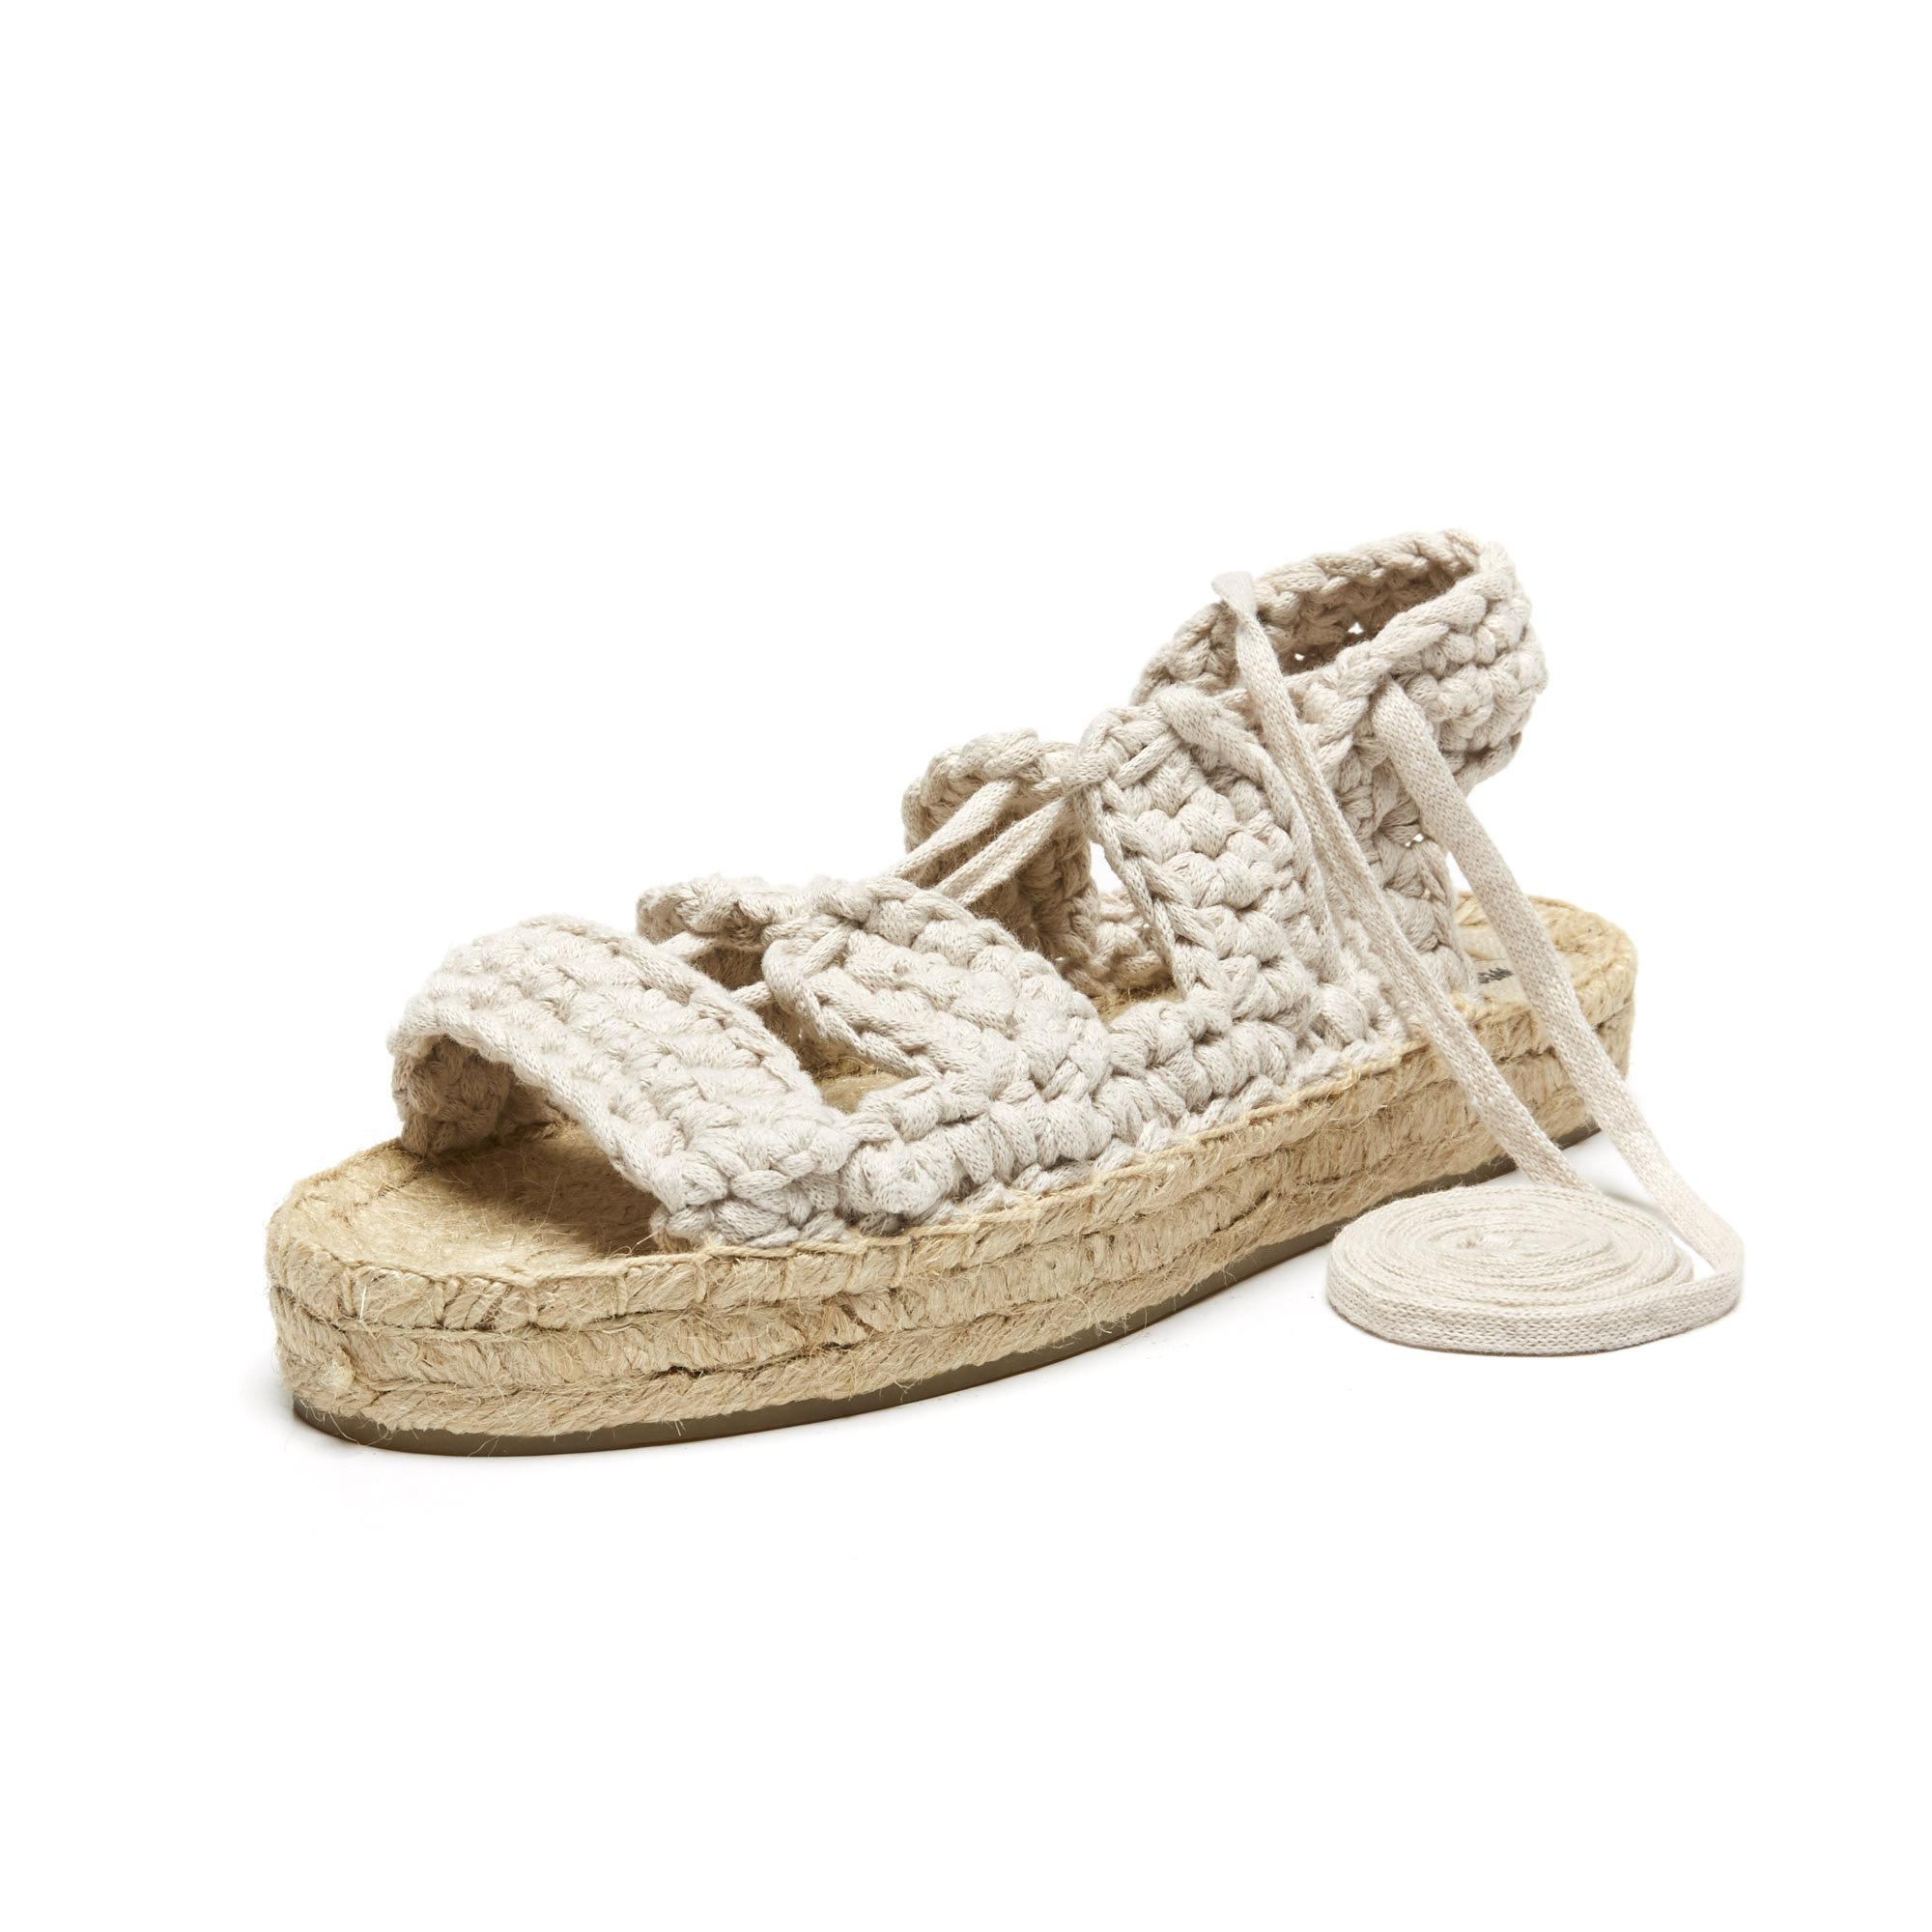 7b01f3fd622f Lyst - Soludos X Watg Diy Platform Sandal in Natural